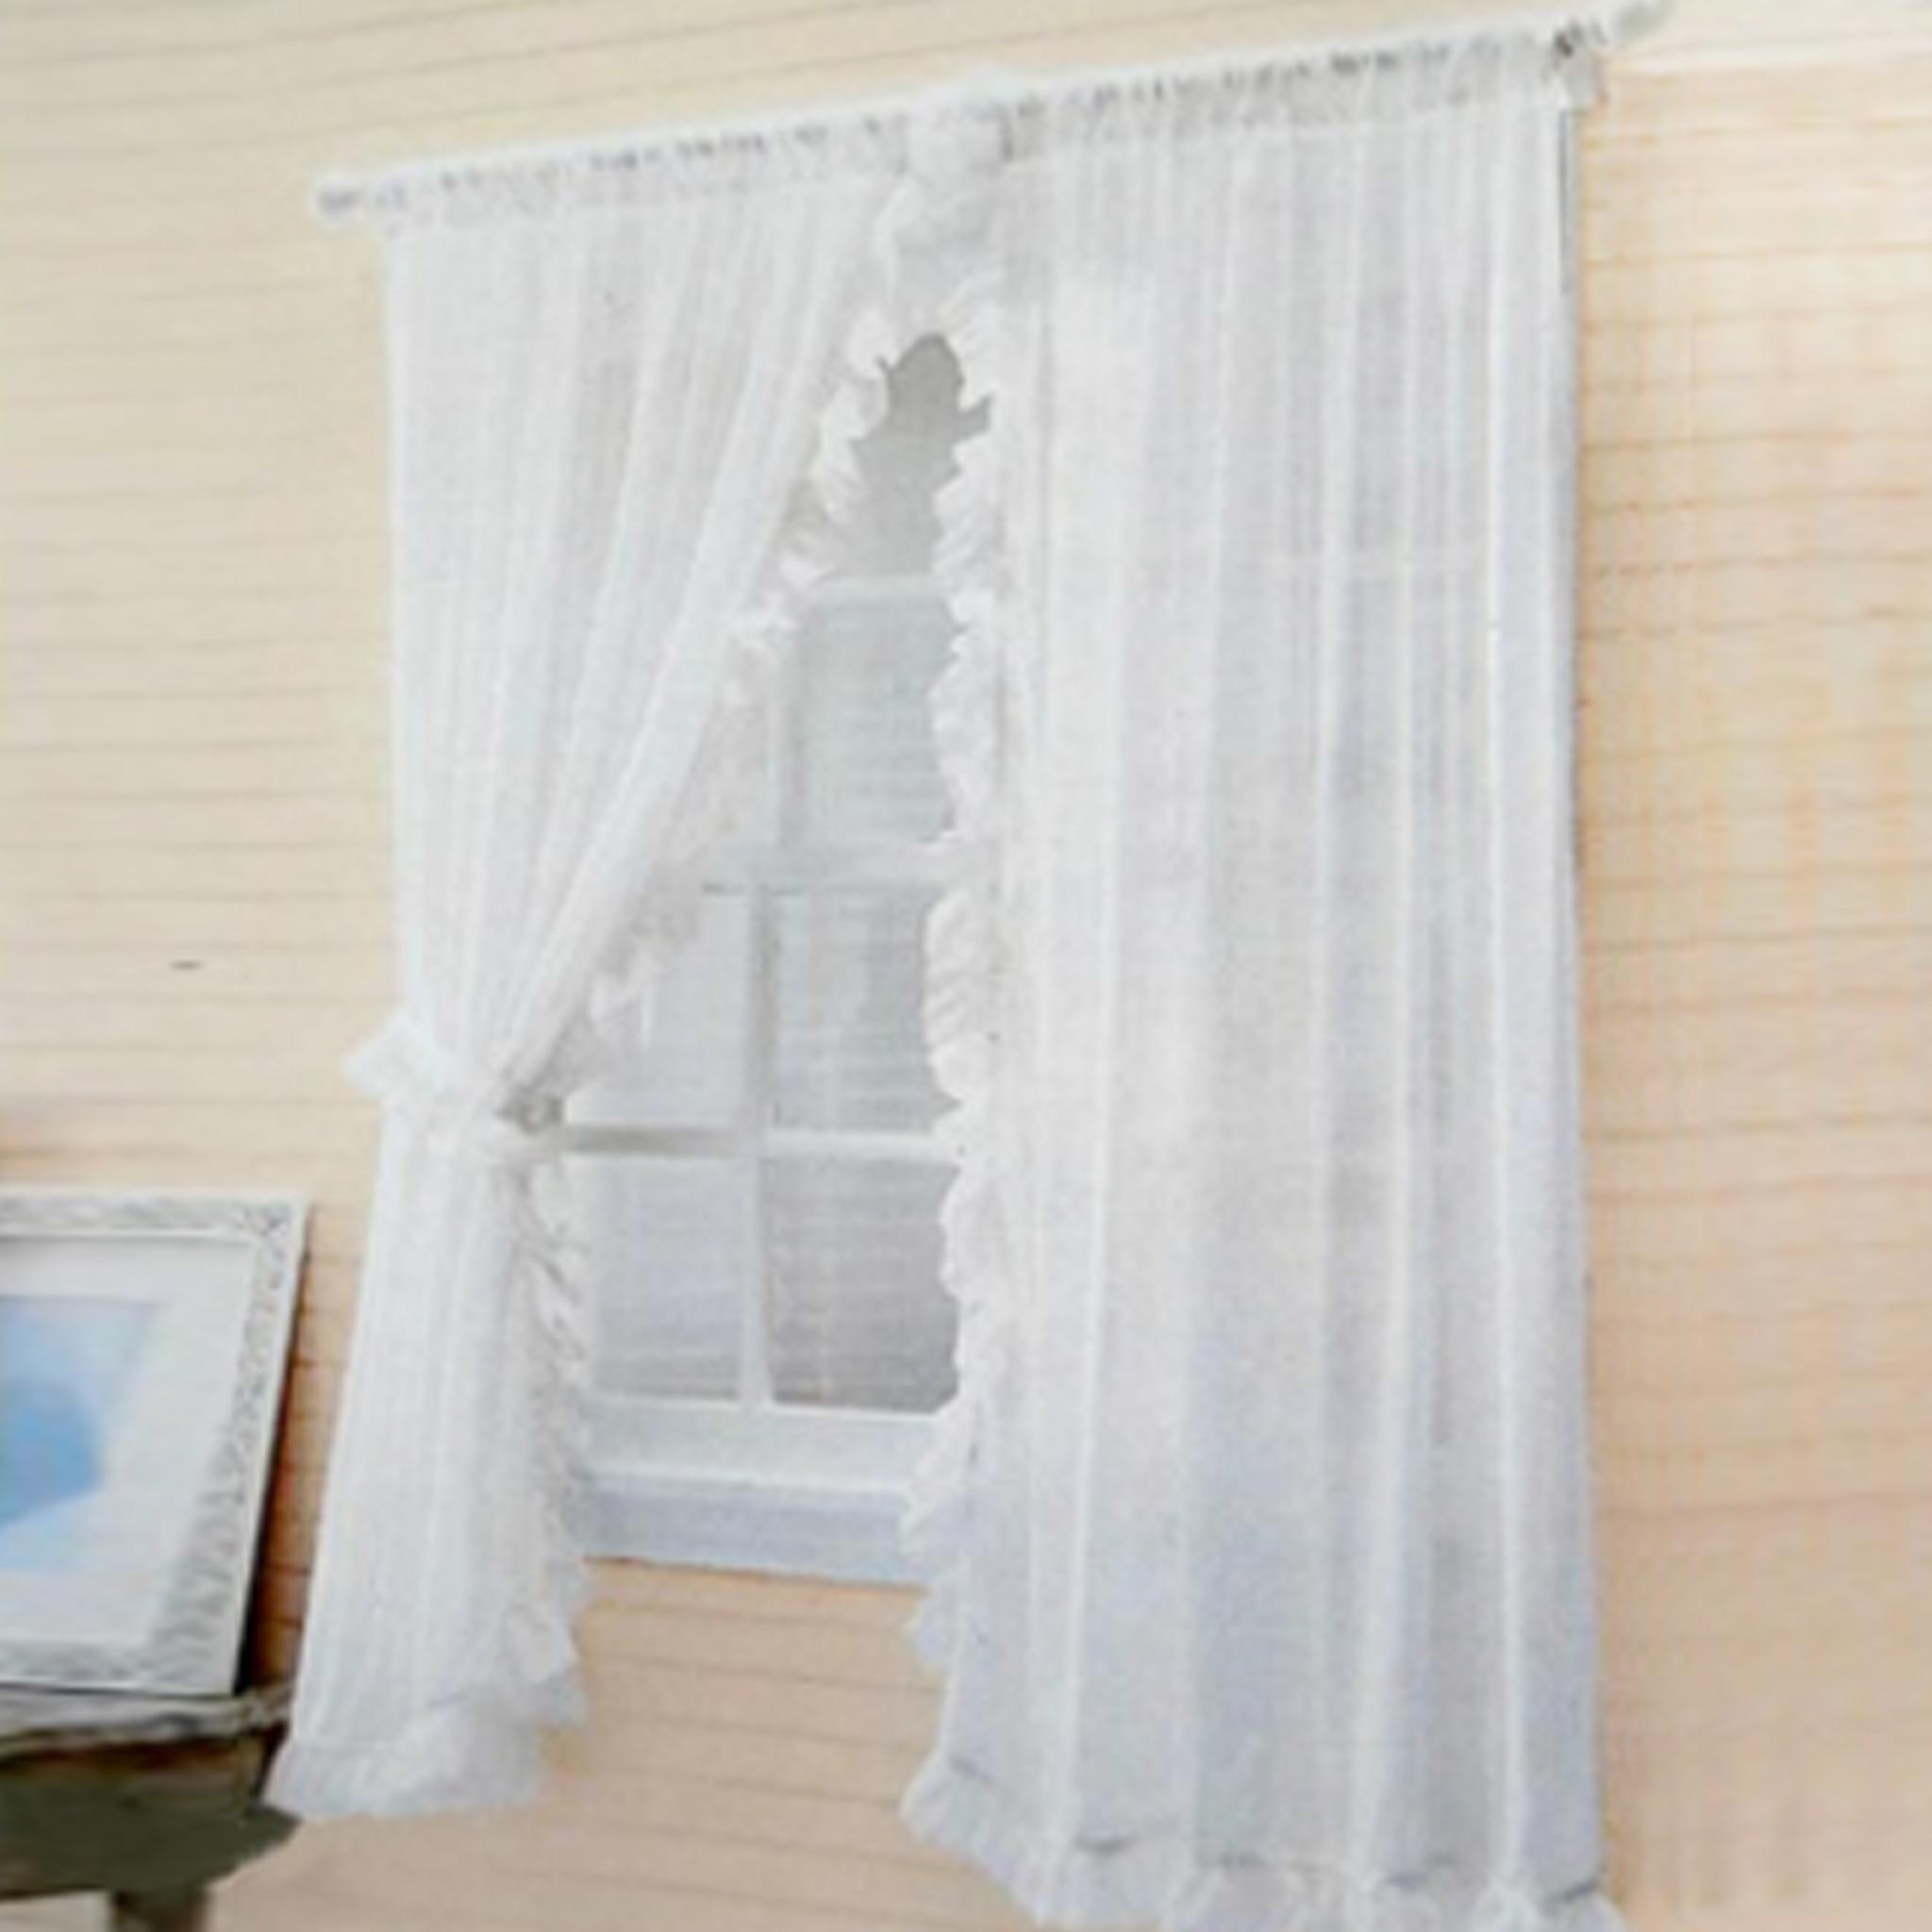 ascot sheer treatment emelia window valance double p v curtains voile panel x curtain